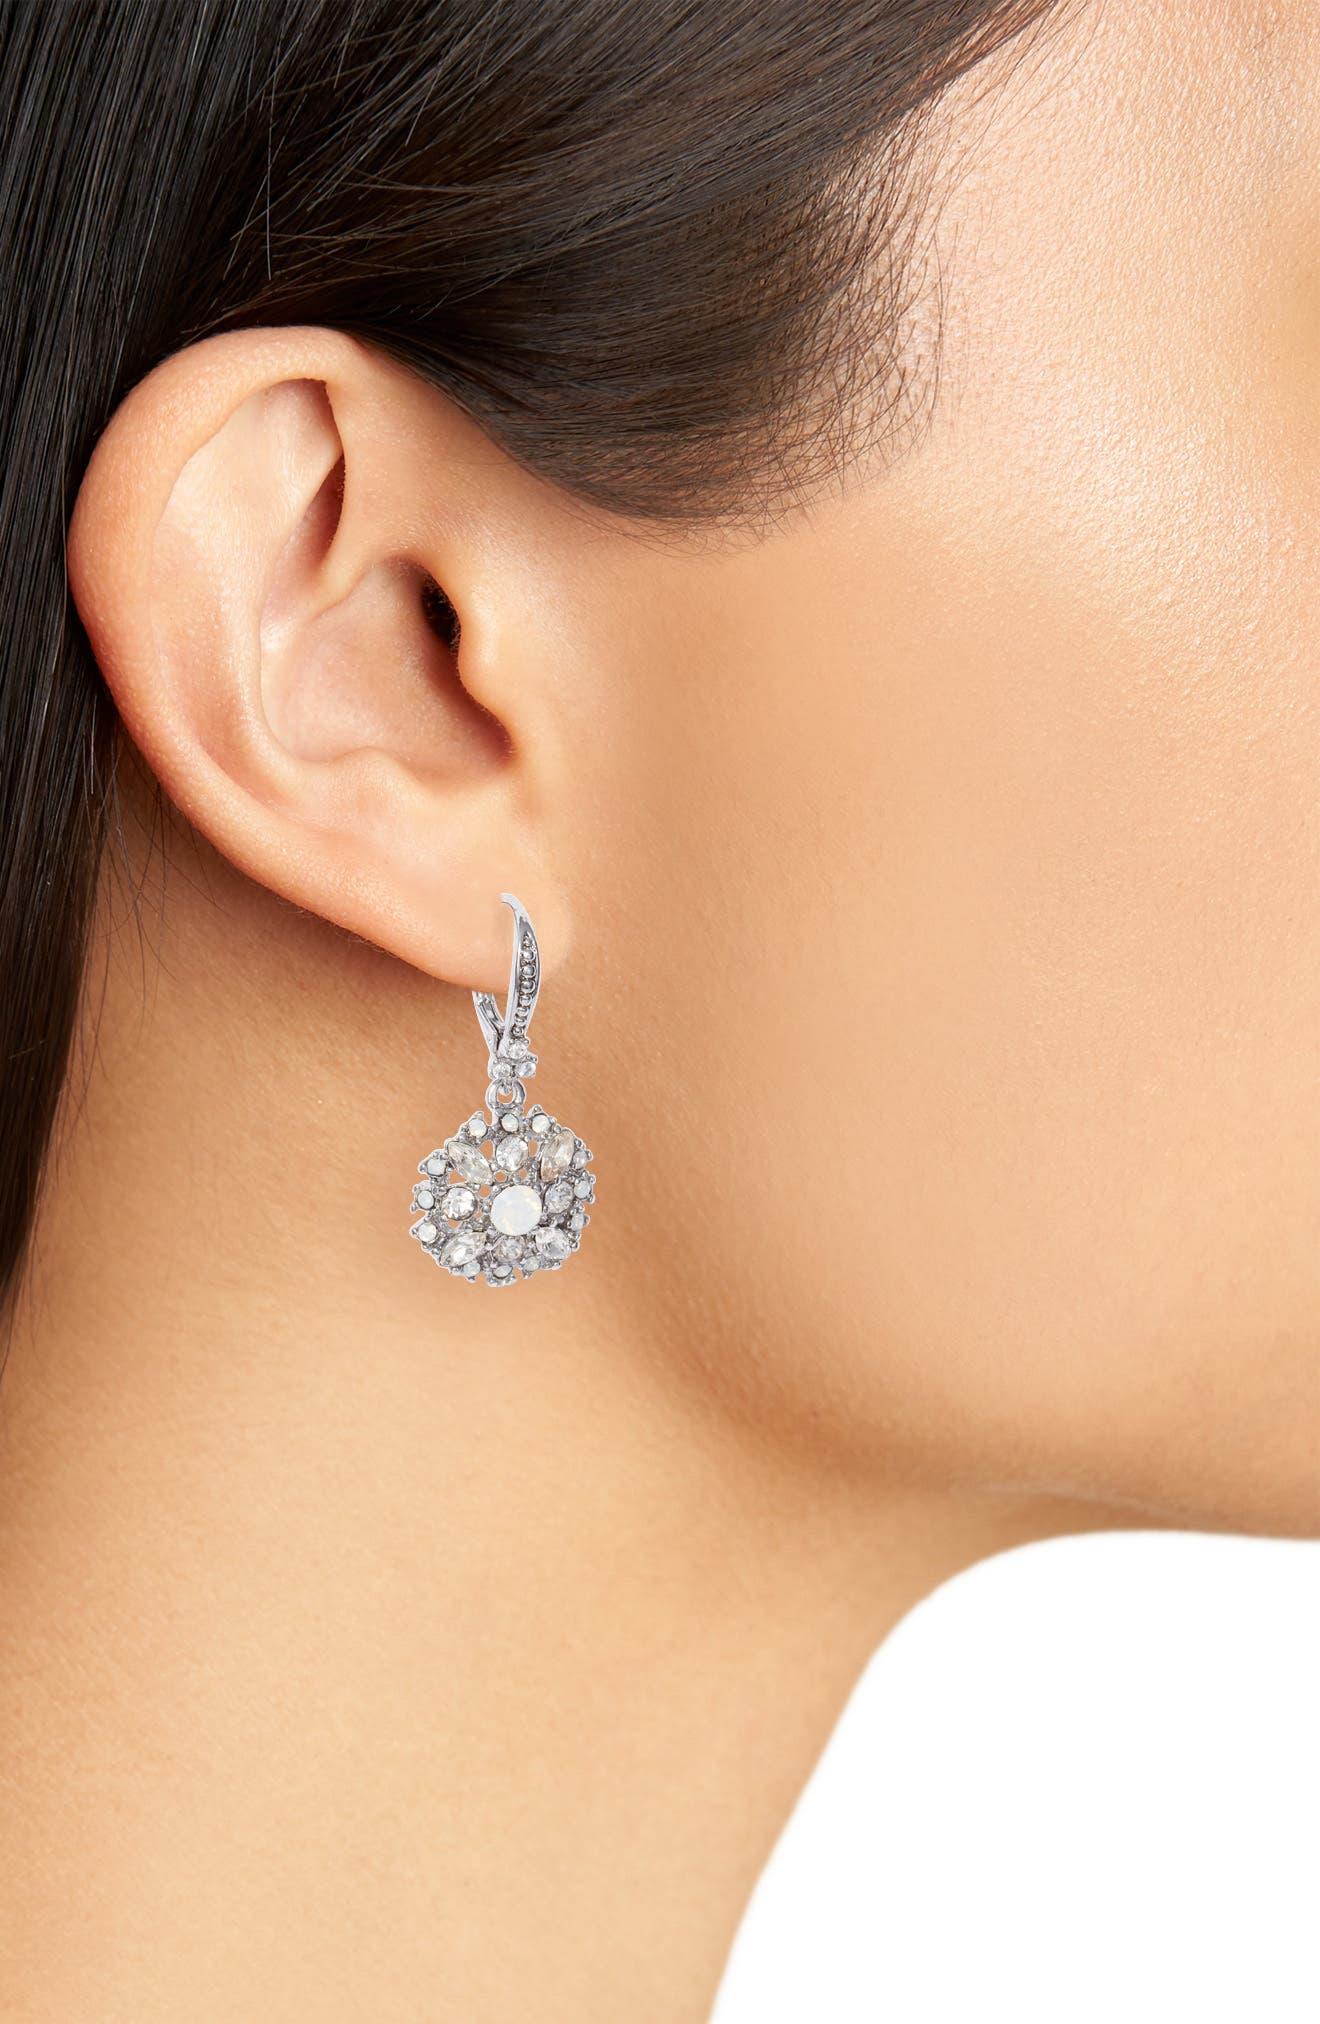 Small Drop Sparkle Earrings,                             Alternate thumbnail 2, color,                             040